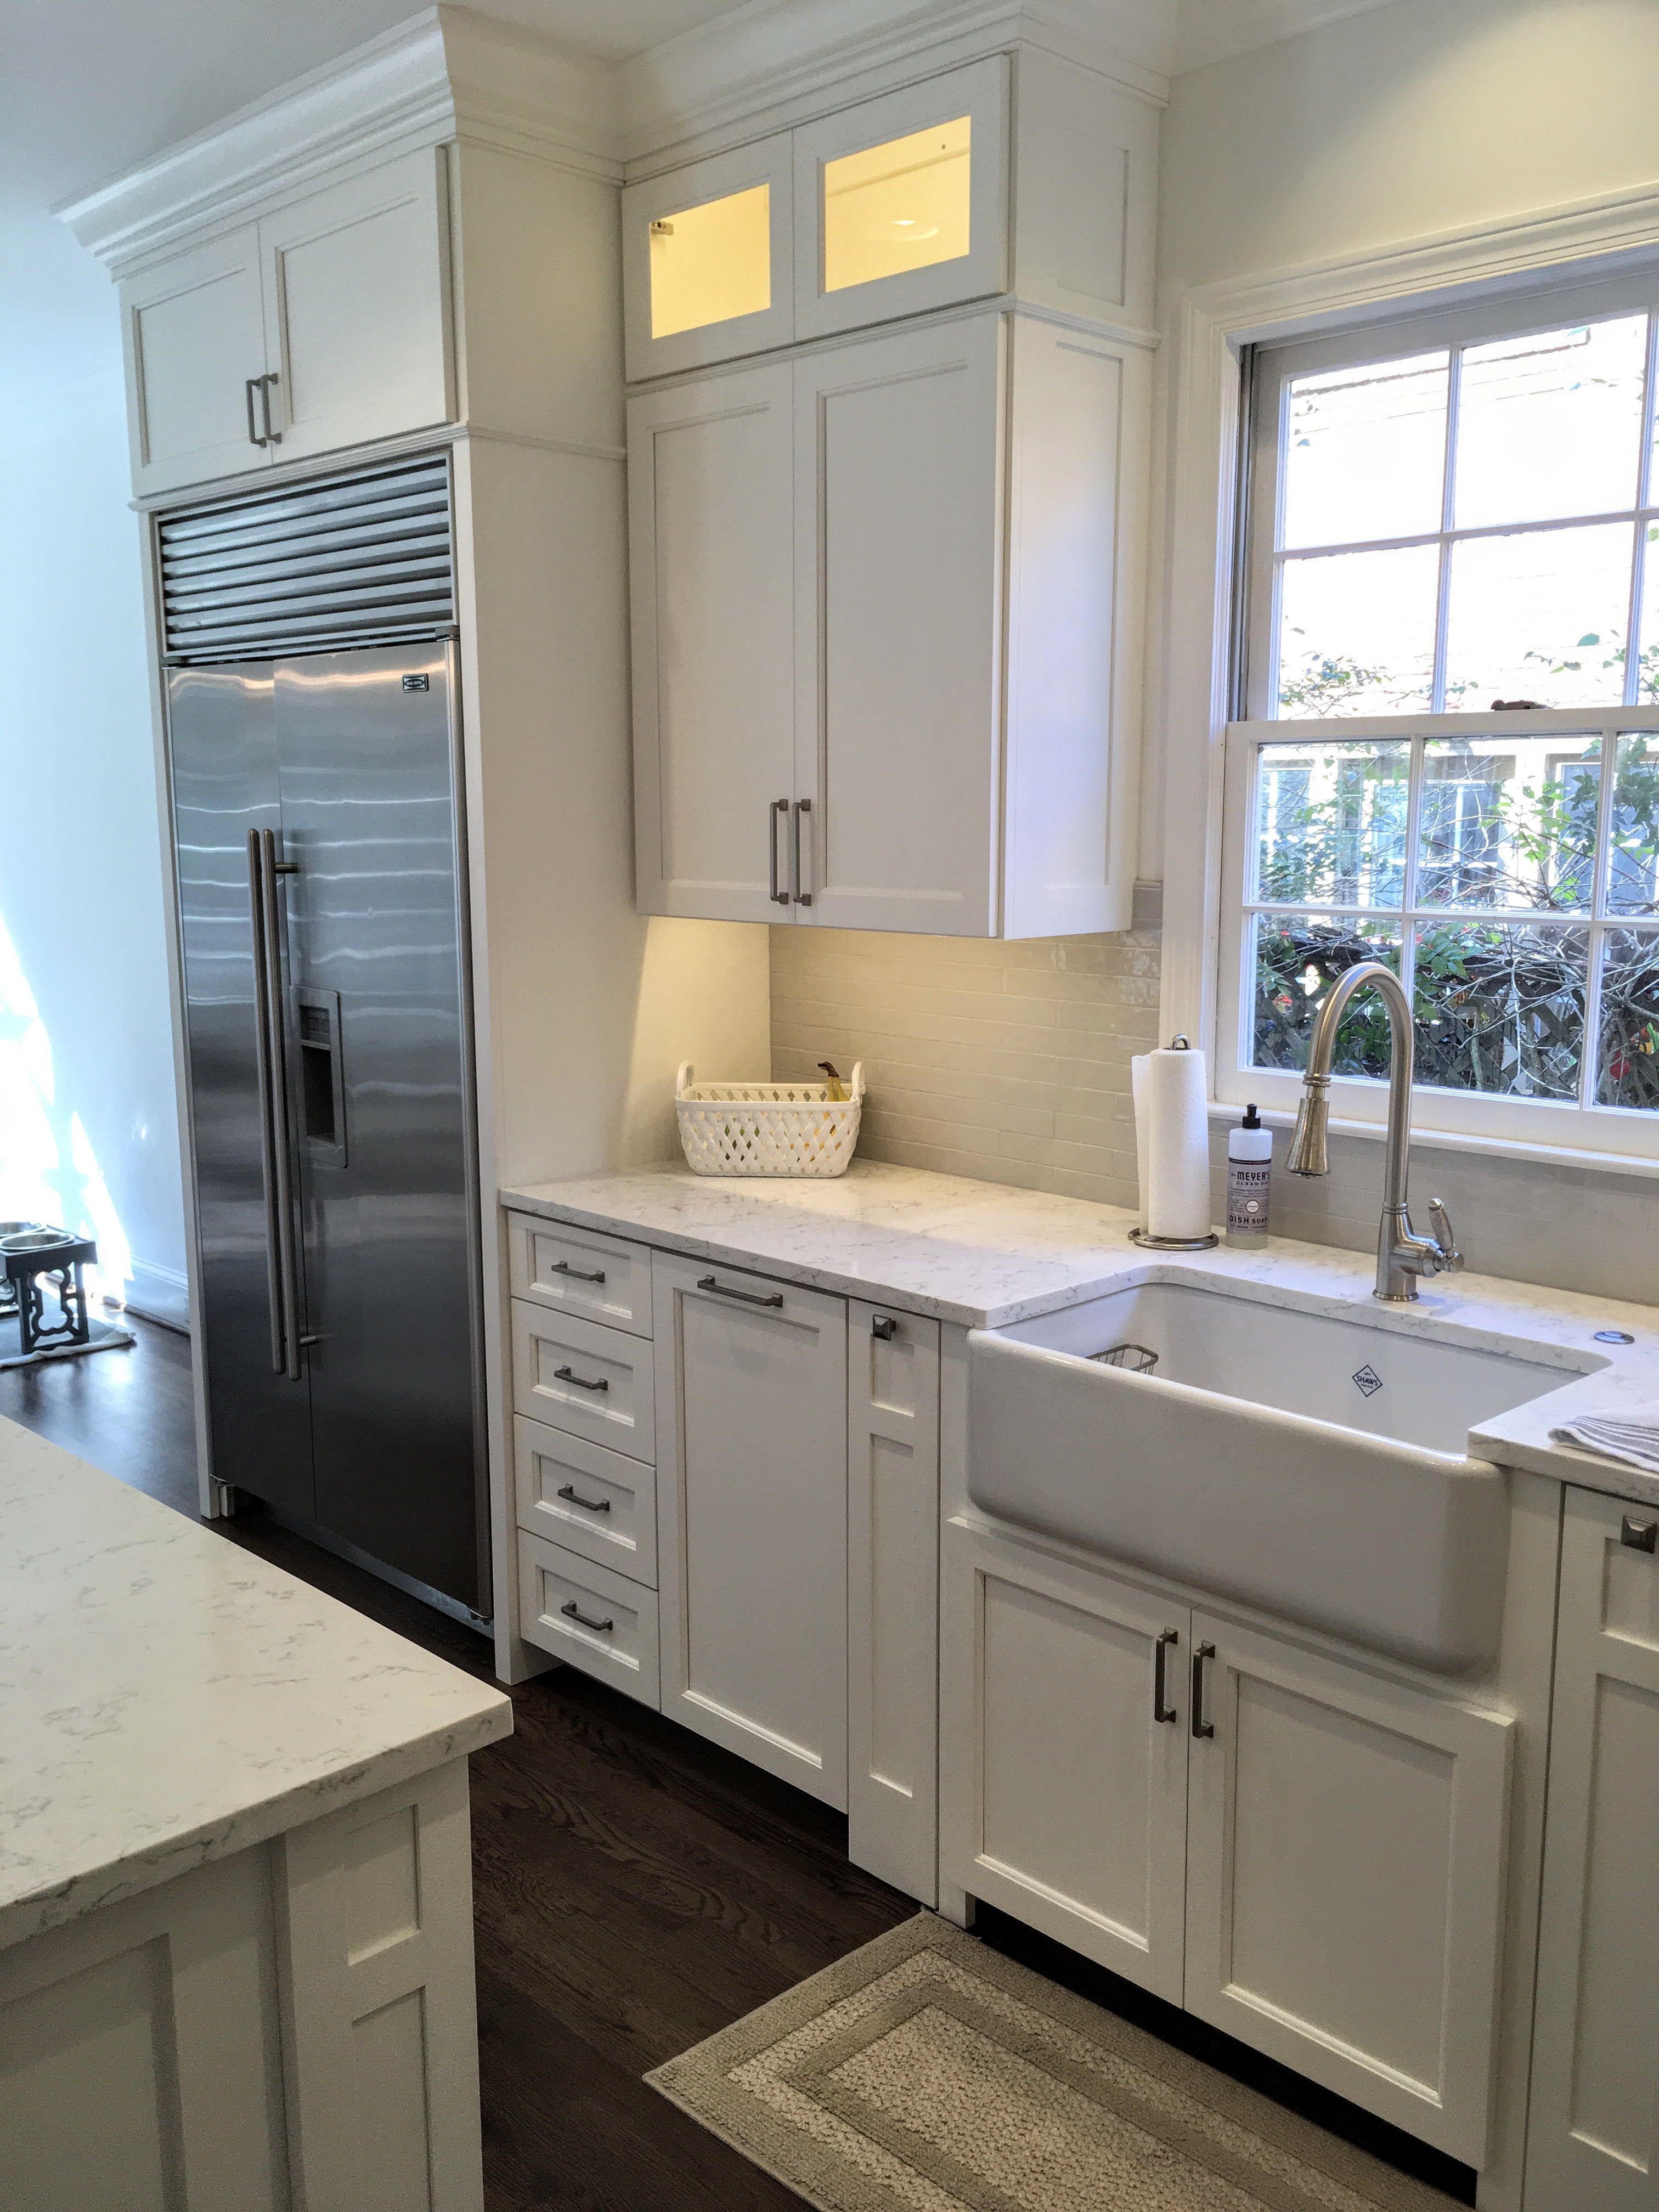 Finished Kitchen Shaker Doors On Full Overlay Cabinets Finished